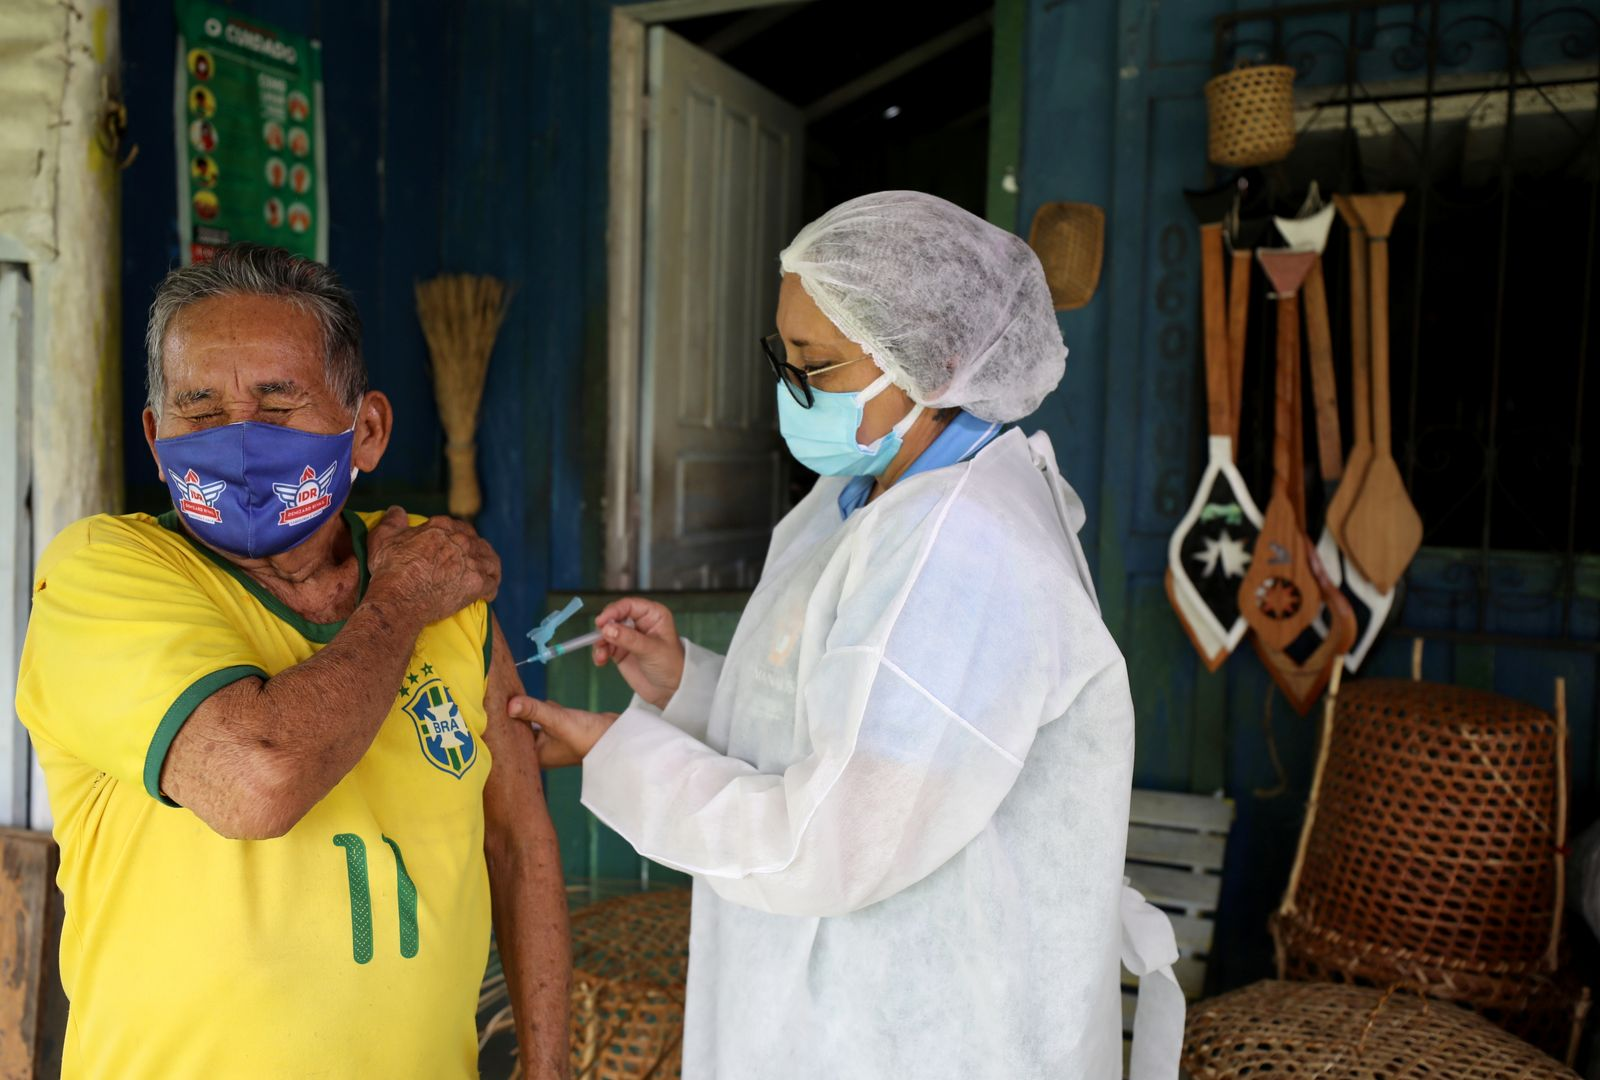 Outbreak of the coronavirus disease (COVID-19) in Amazon